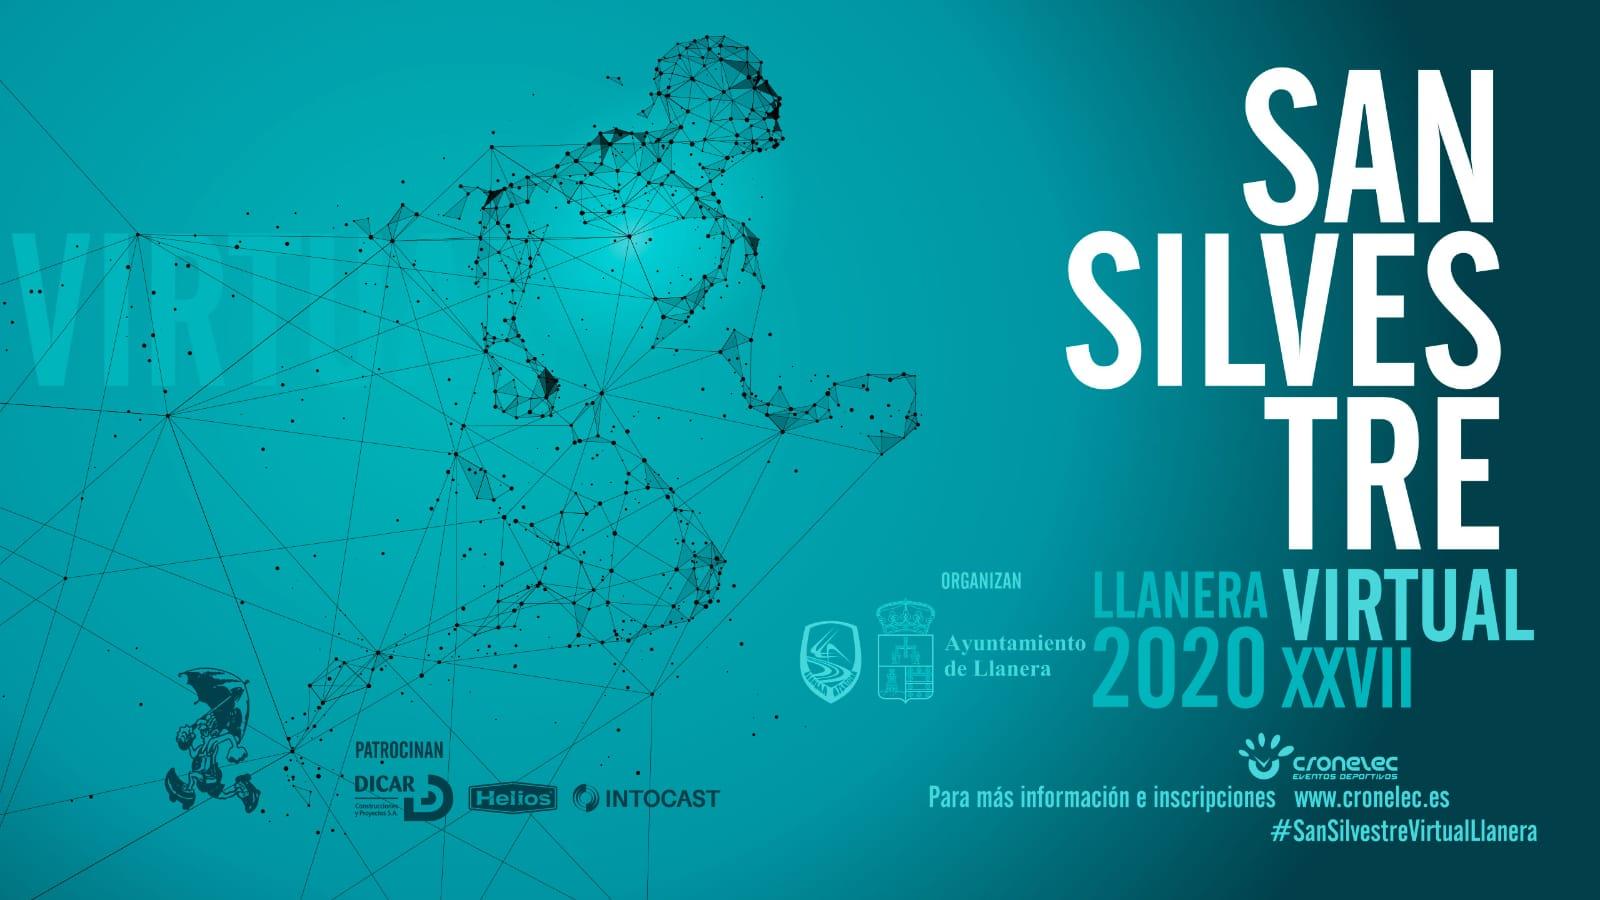 XXVII  San Silvestre de Llanera 2020